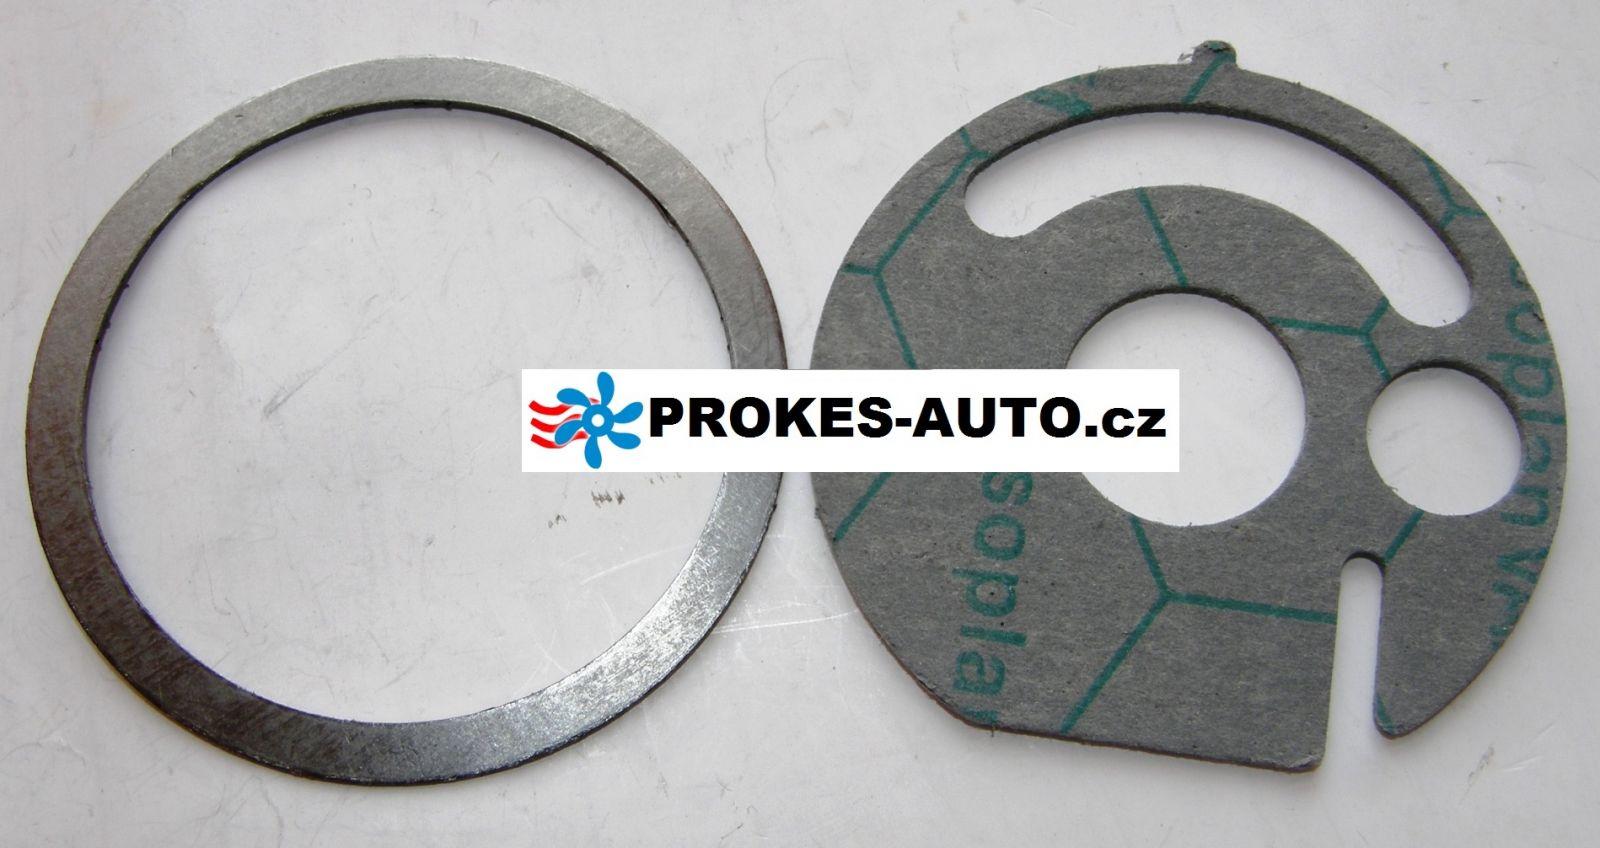 Seal kit Hydronic D3WZ / D5WZ / D5W S / D4W S / SC 201820990001 / 20.1820.99.0001 / 20 1820 99 0001 / 201752990101 Eberspächer